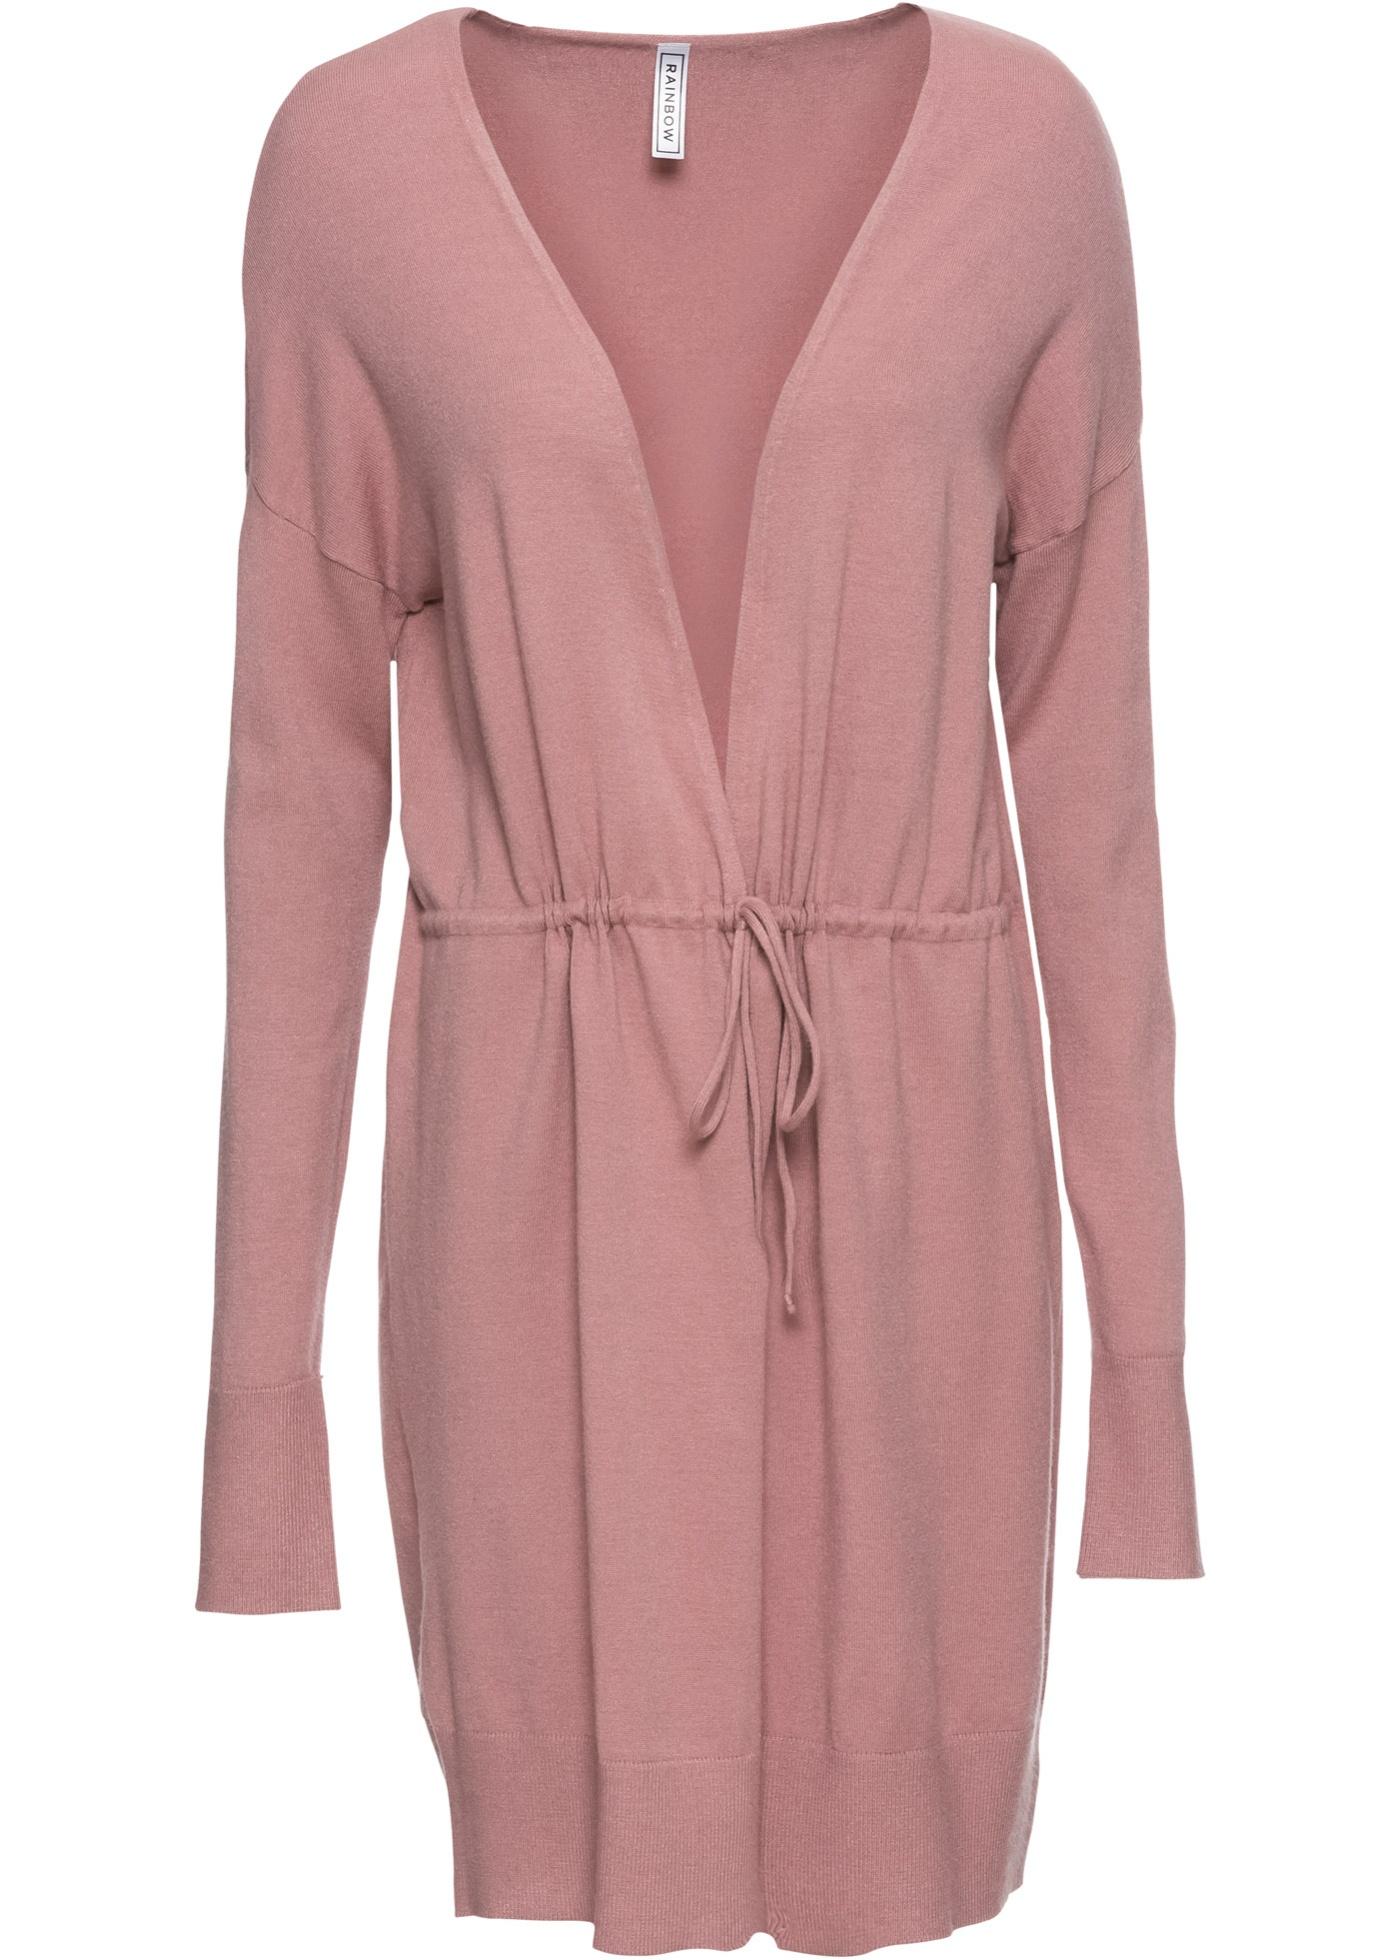 Dlouhý pletený kabátek s páskem - Růžová